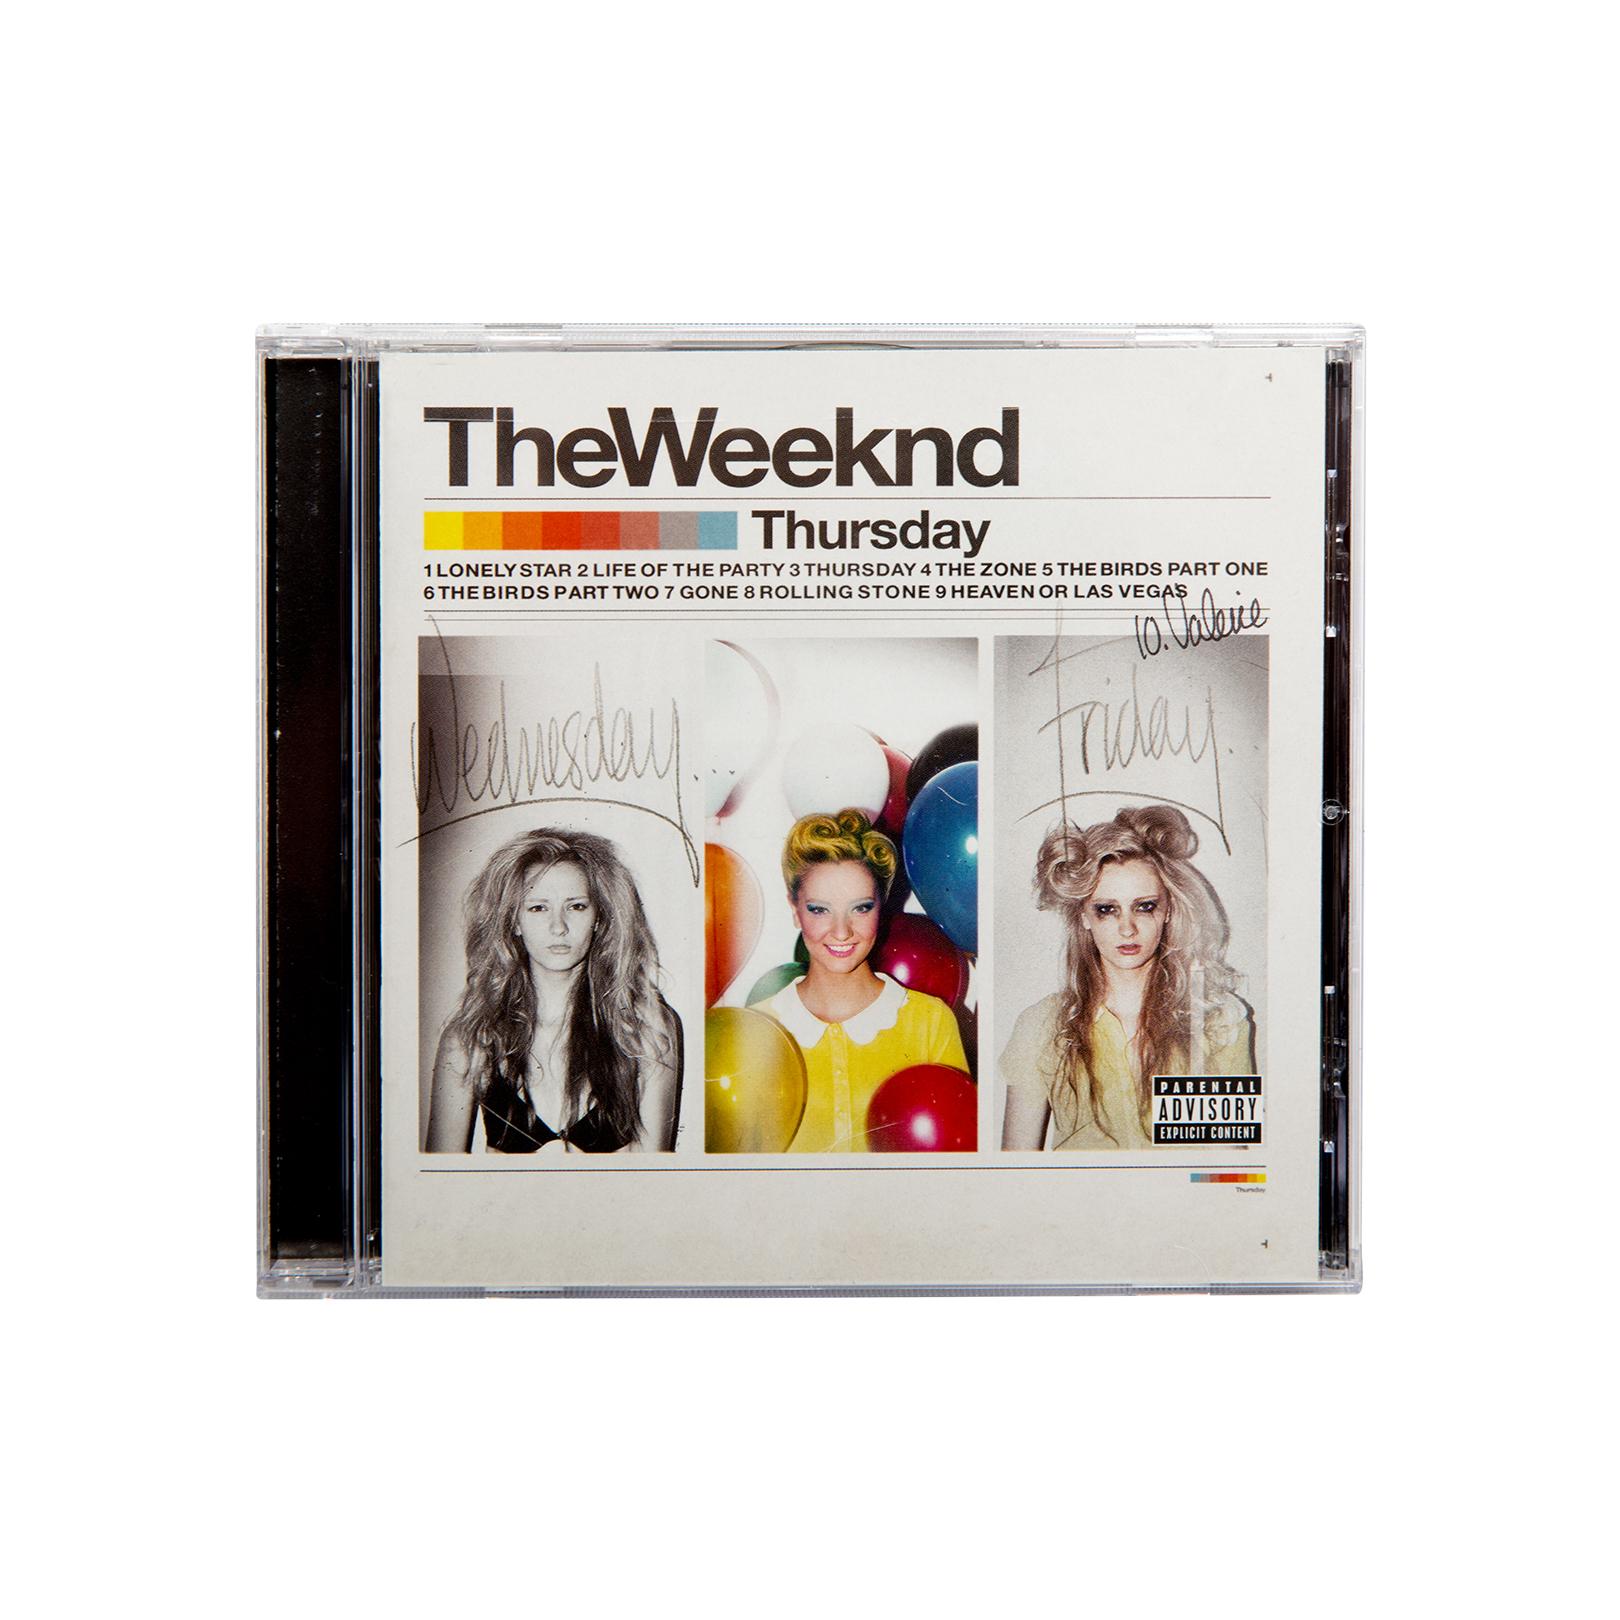 thursday mixtape the weeknd - HD1280×1280